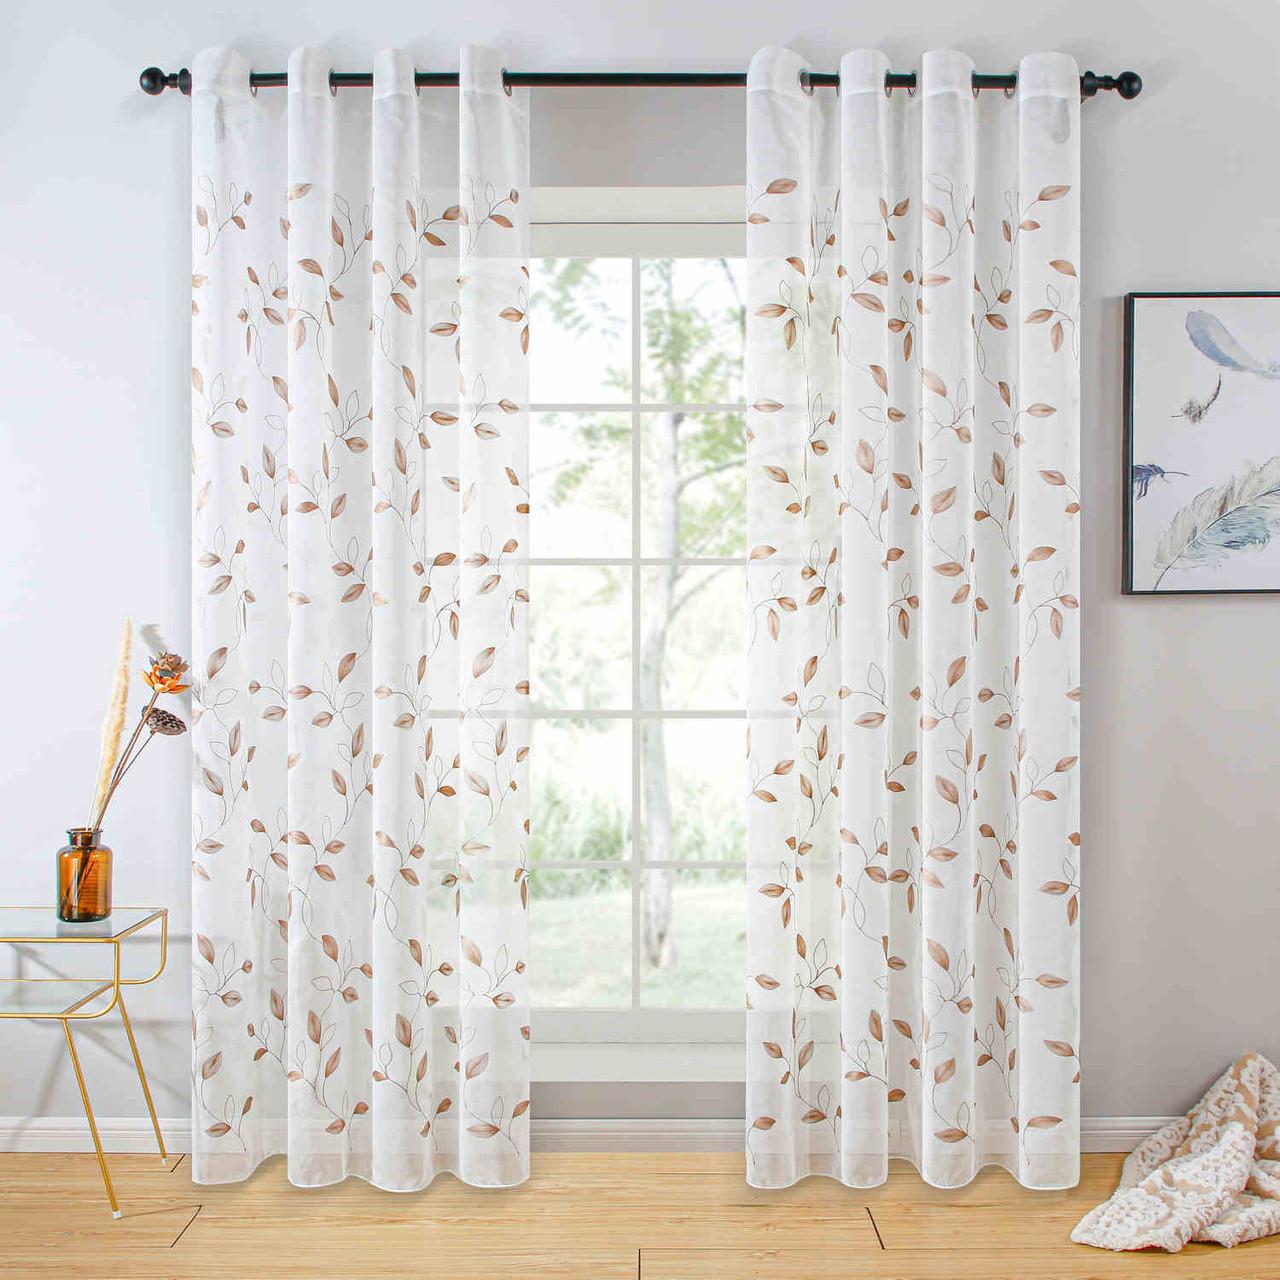 Sheer Curtain Panel Grommet Top Window Treatments Dmc729 Dolce Mela 8171460152140